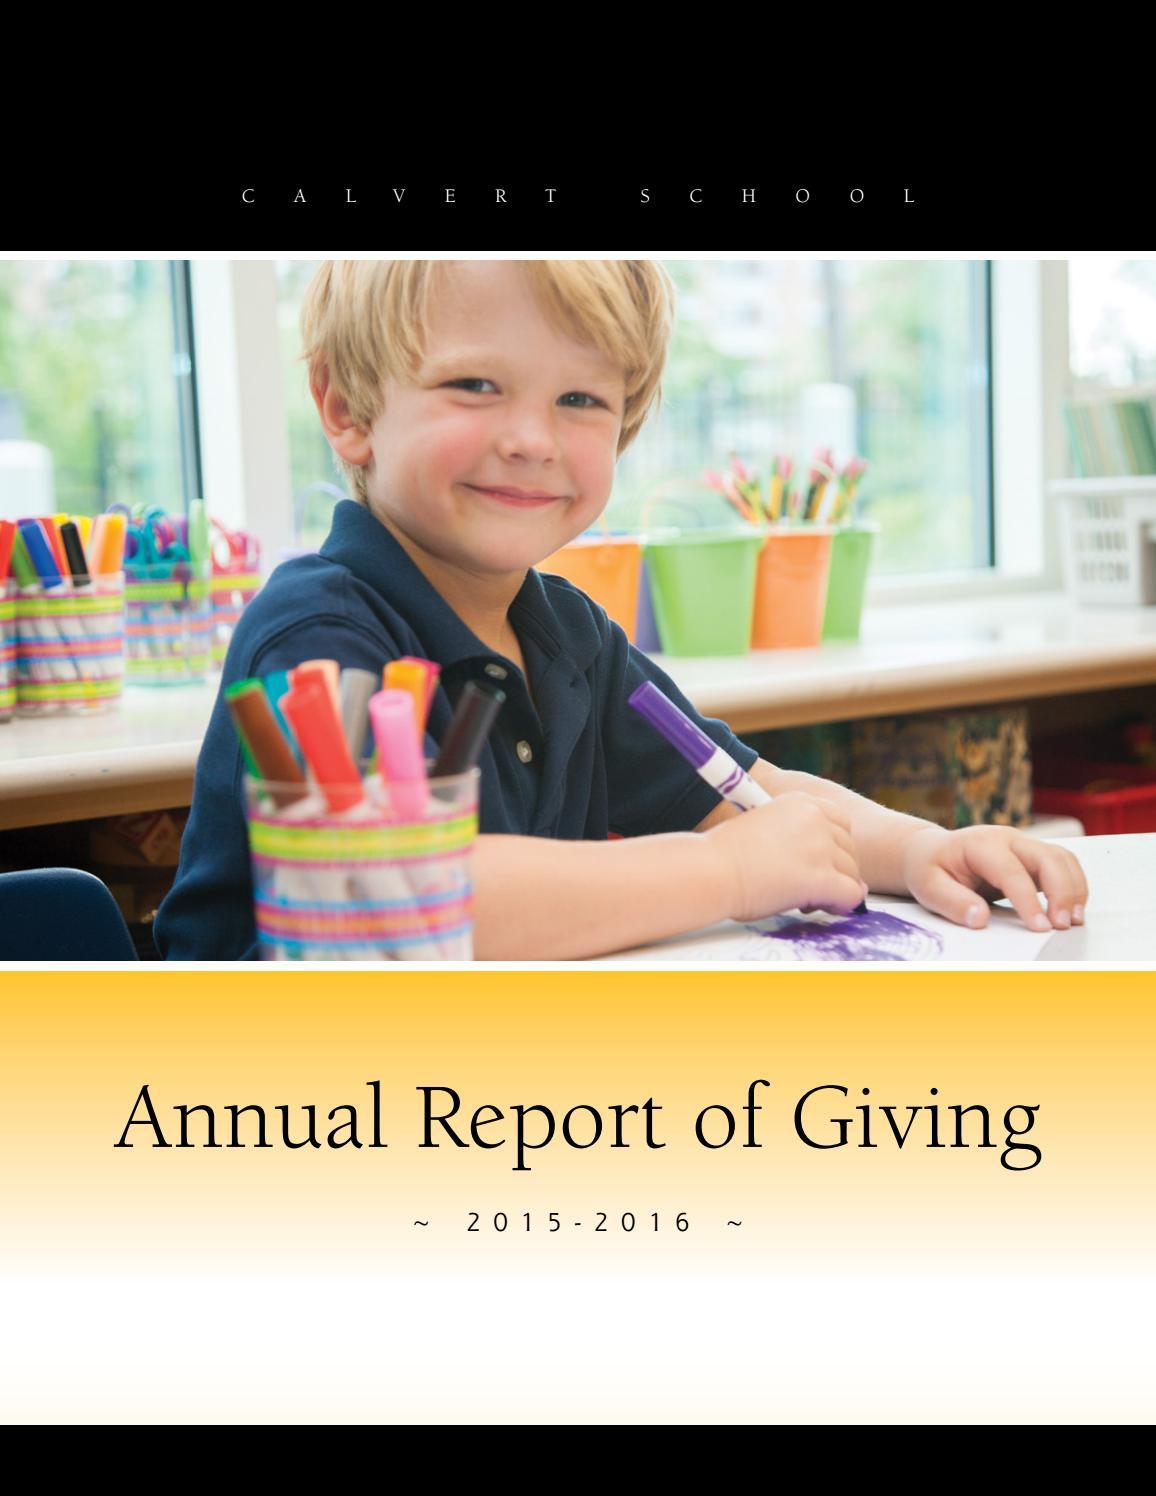 53ebb04155b1 Annual Report 2015-2016 by Calvert School - issuu